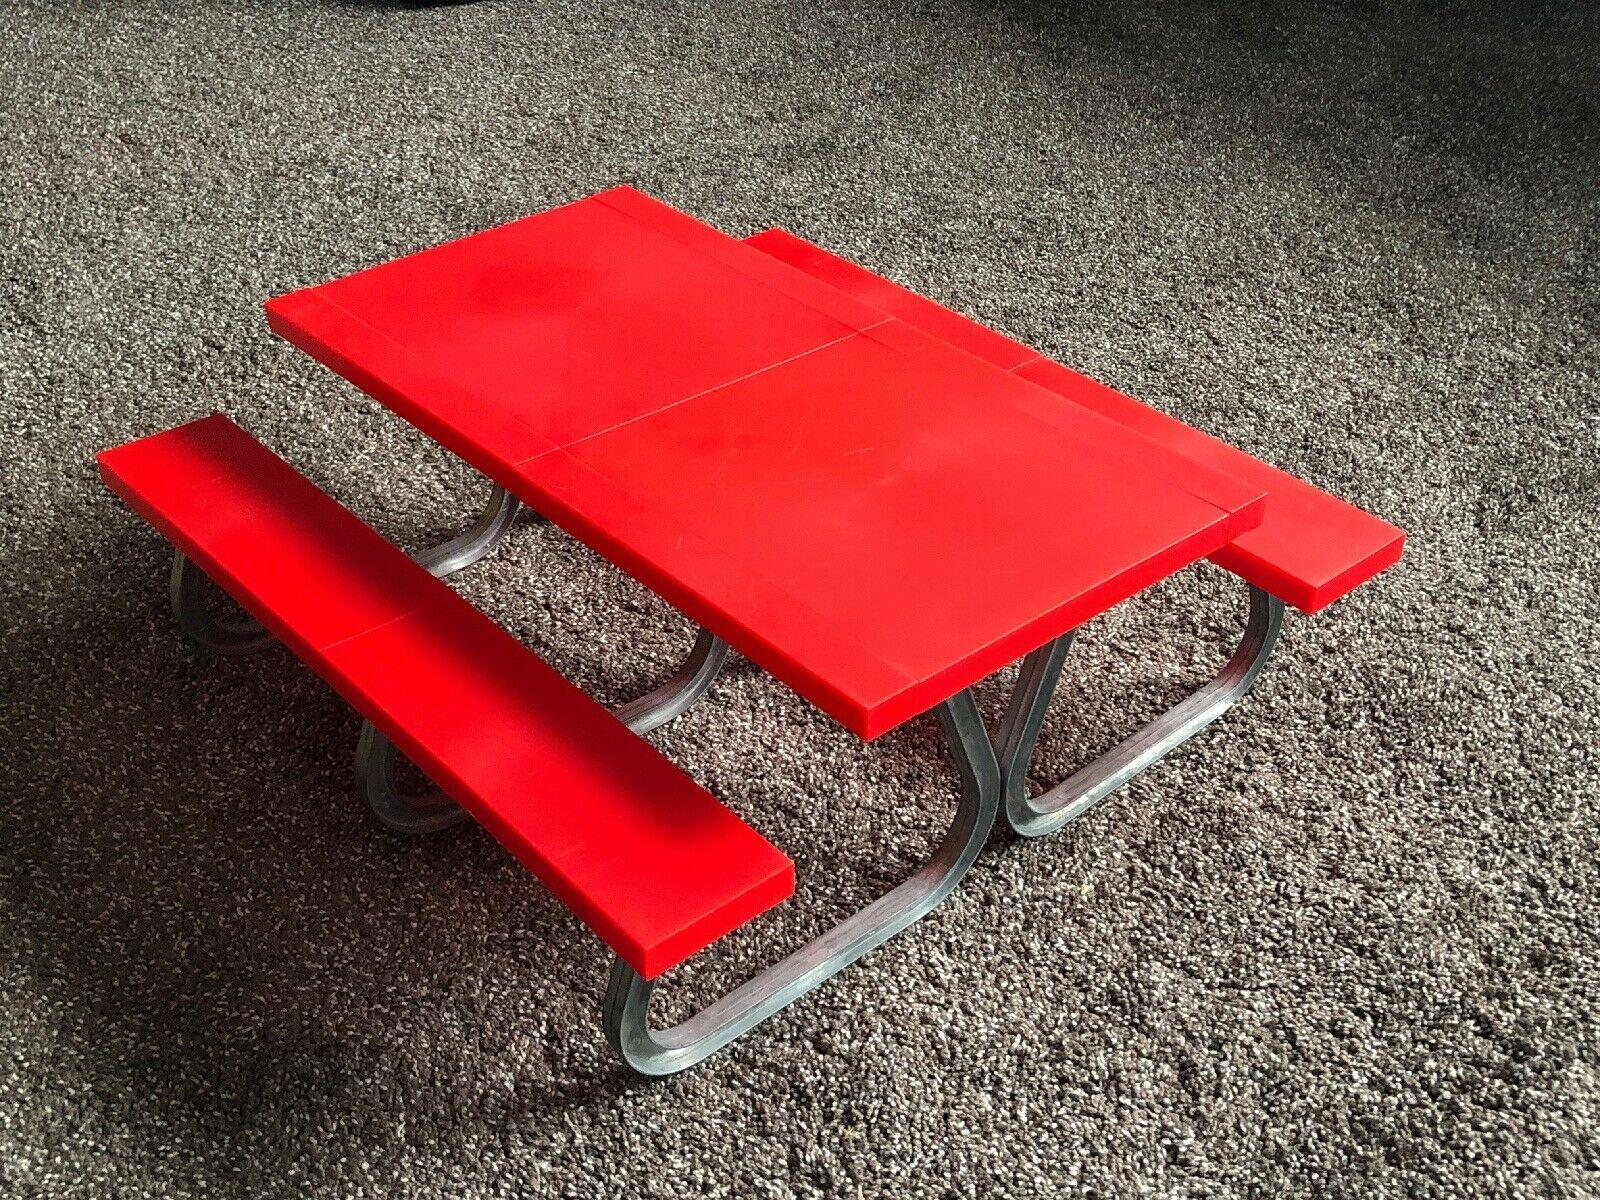 36.0 Handboarding Picnic Table By Tech Deck